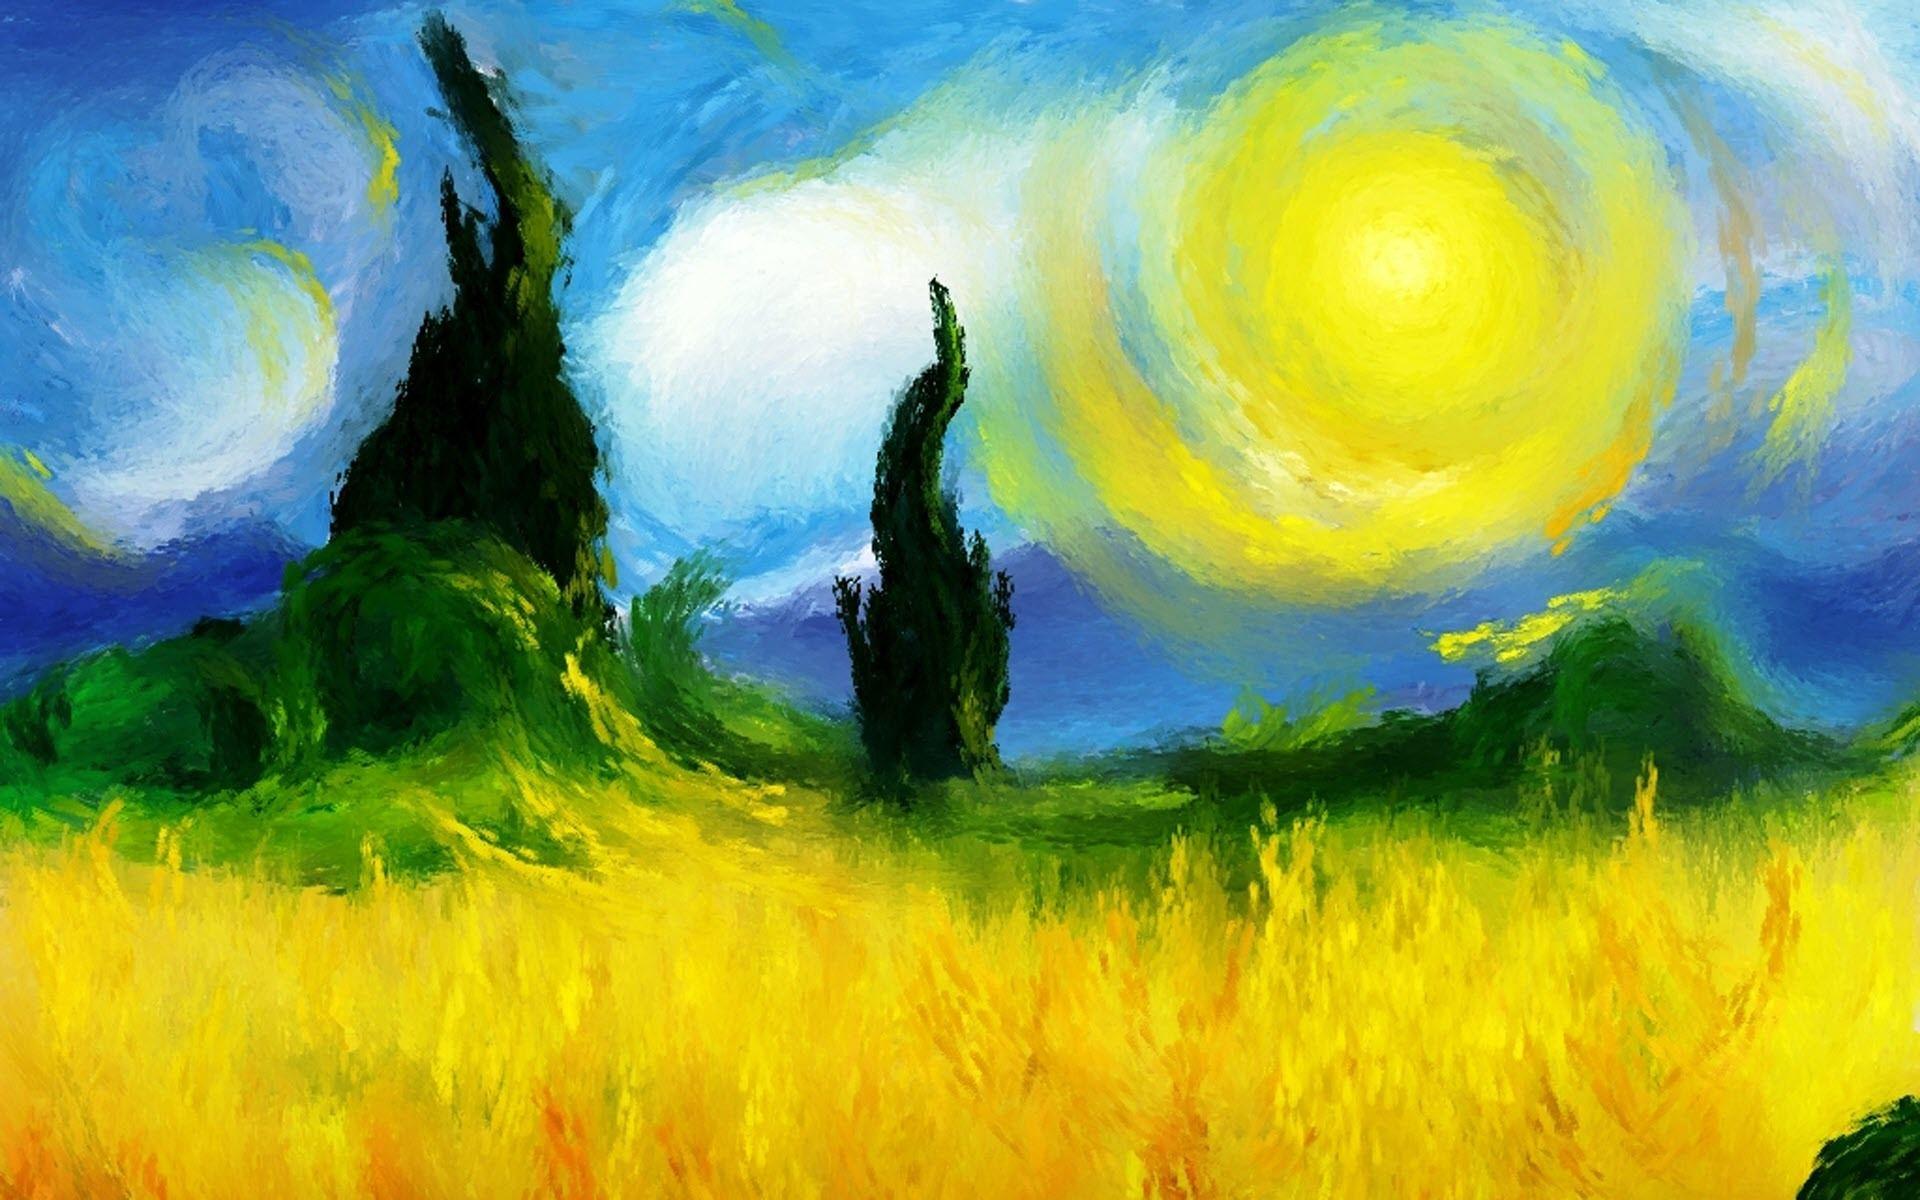 High Resolution Wallpaper | Impressionist 1920x1200 px